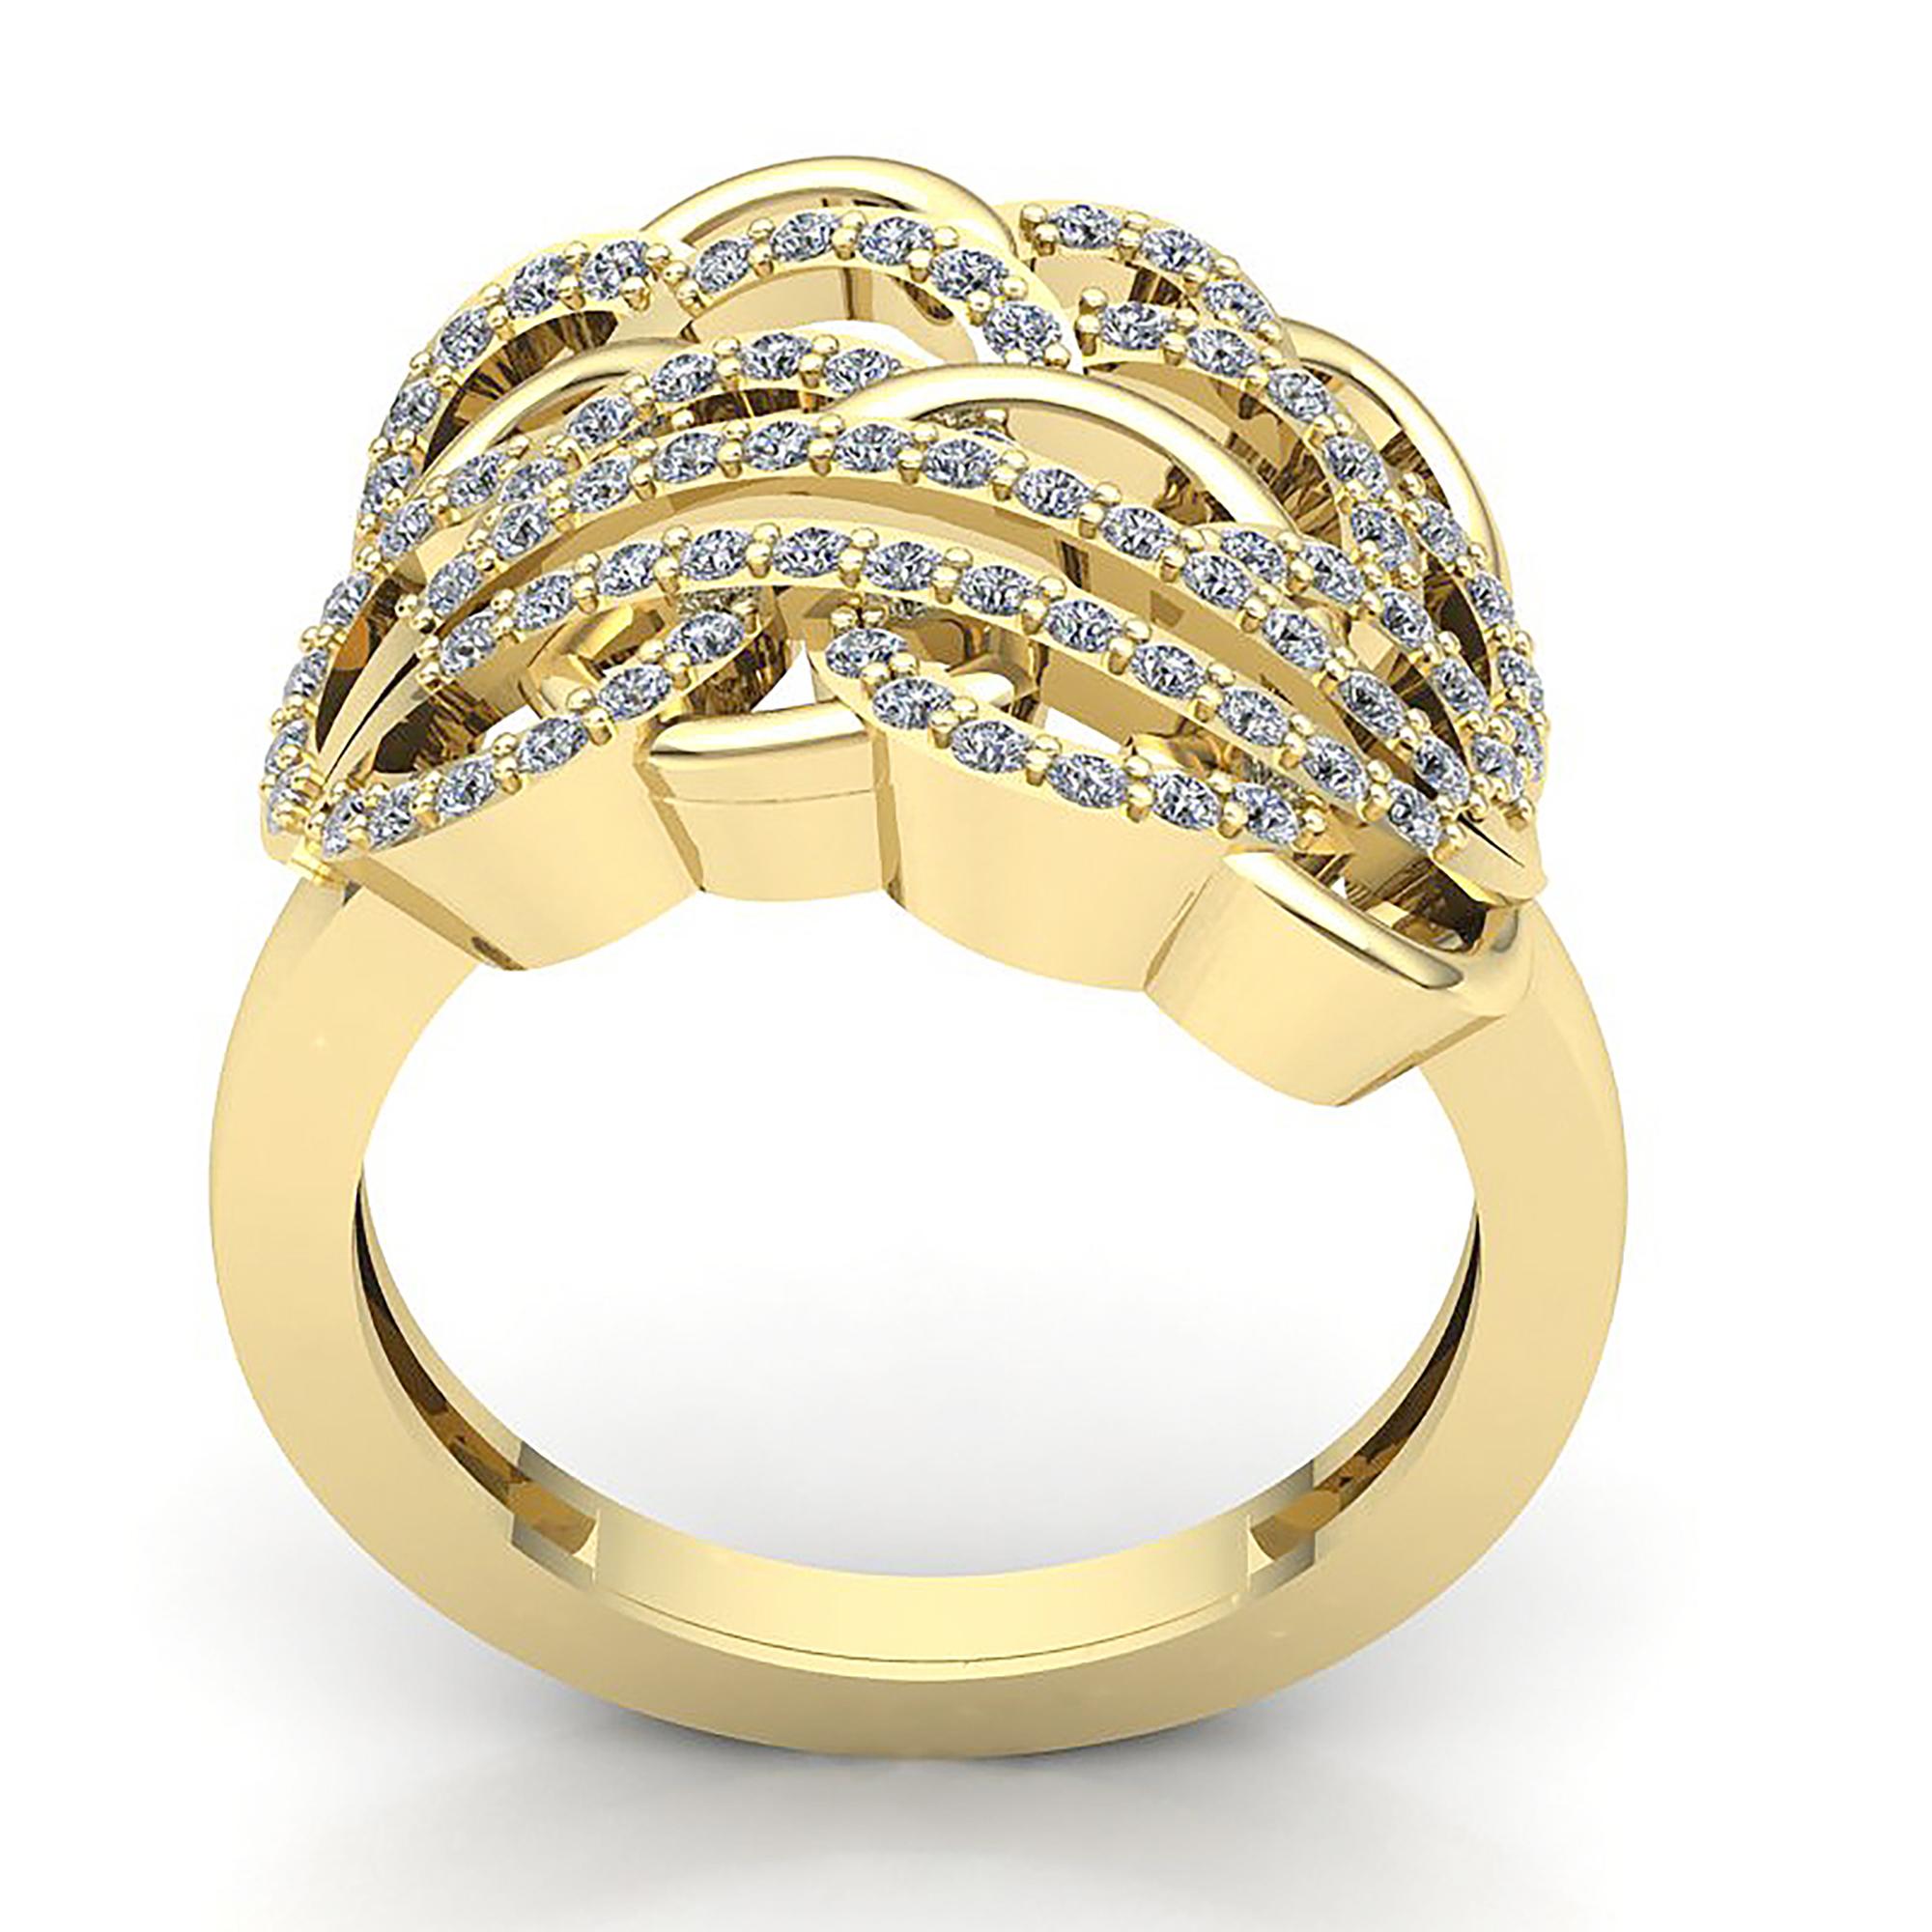 05ct Round Not Enhanced Diamond Womens Interlinked Wedding Band